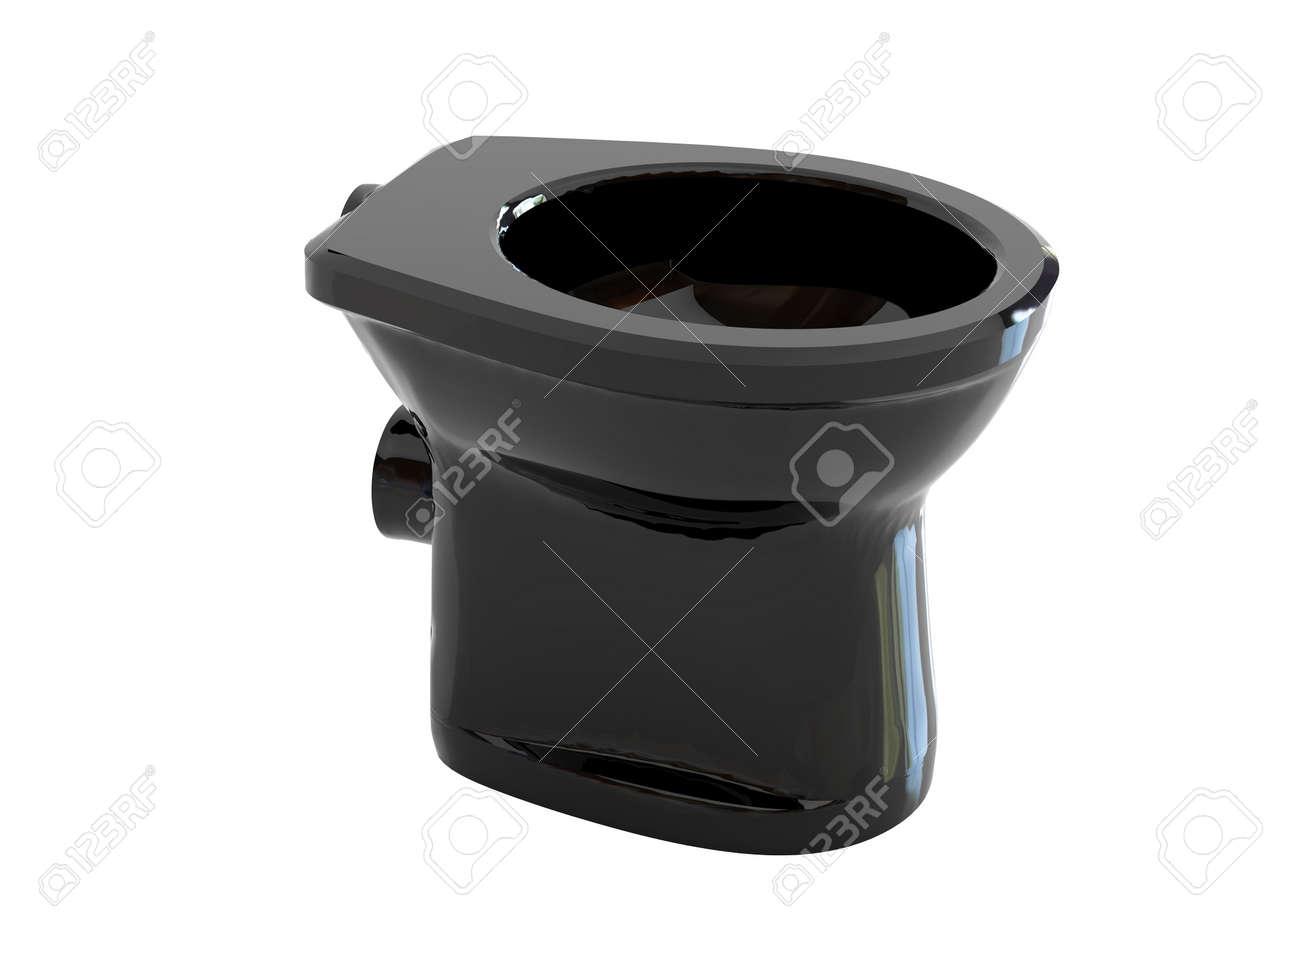 High resolution image black toilet bowl. 3d illustration over  white backgrounds. Stock Illustration - 2626075